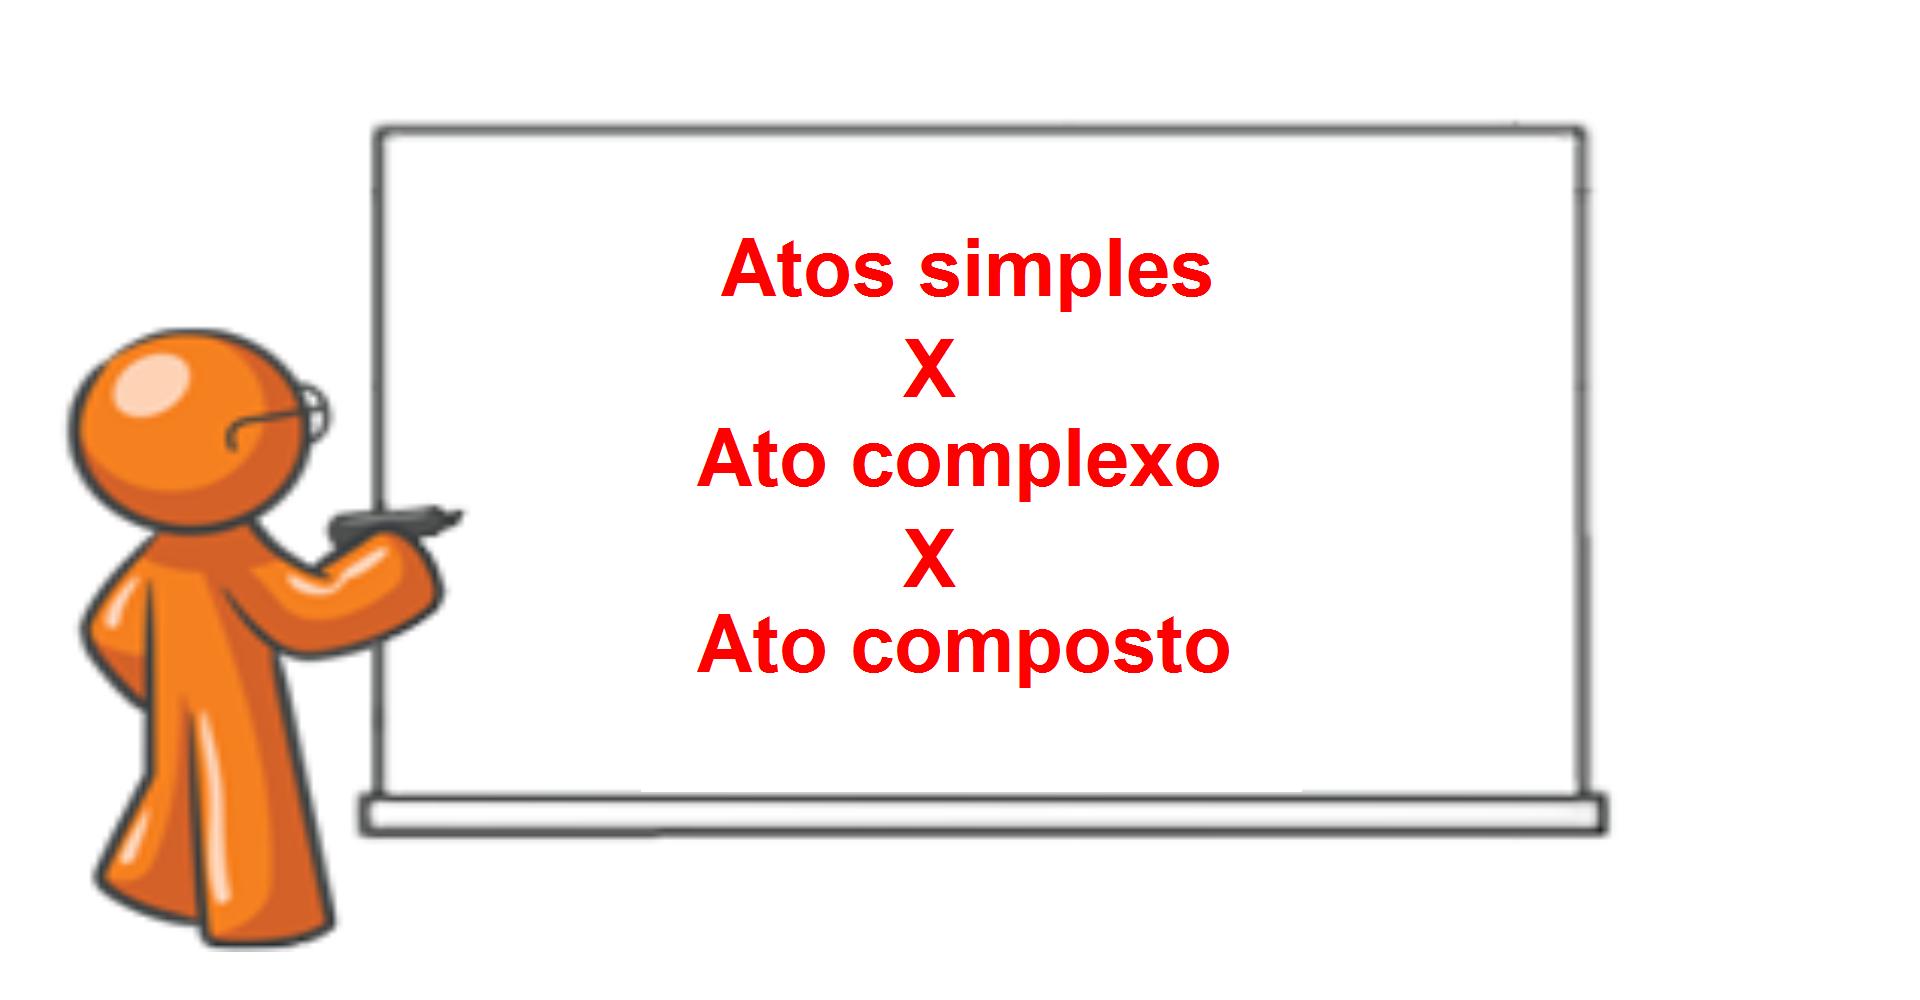 Ato administrativo simples, complexo e composto